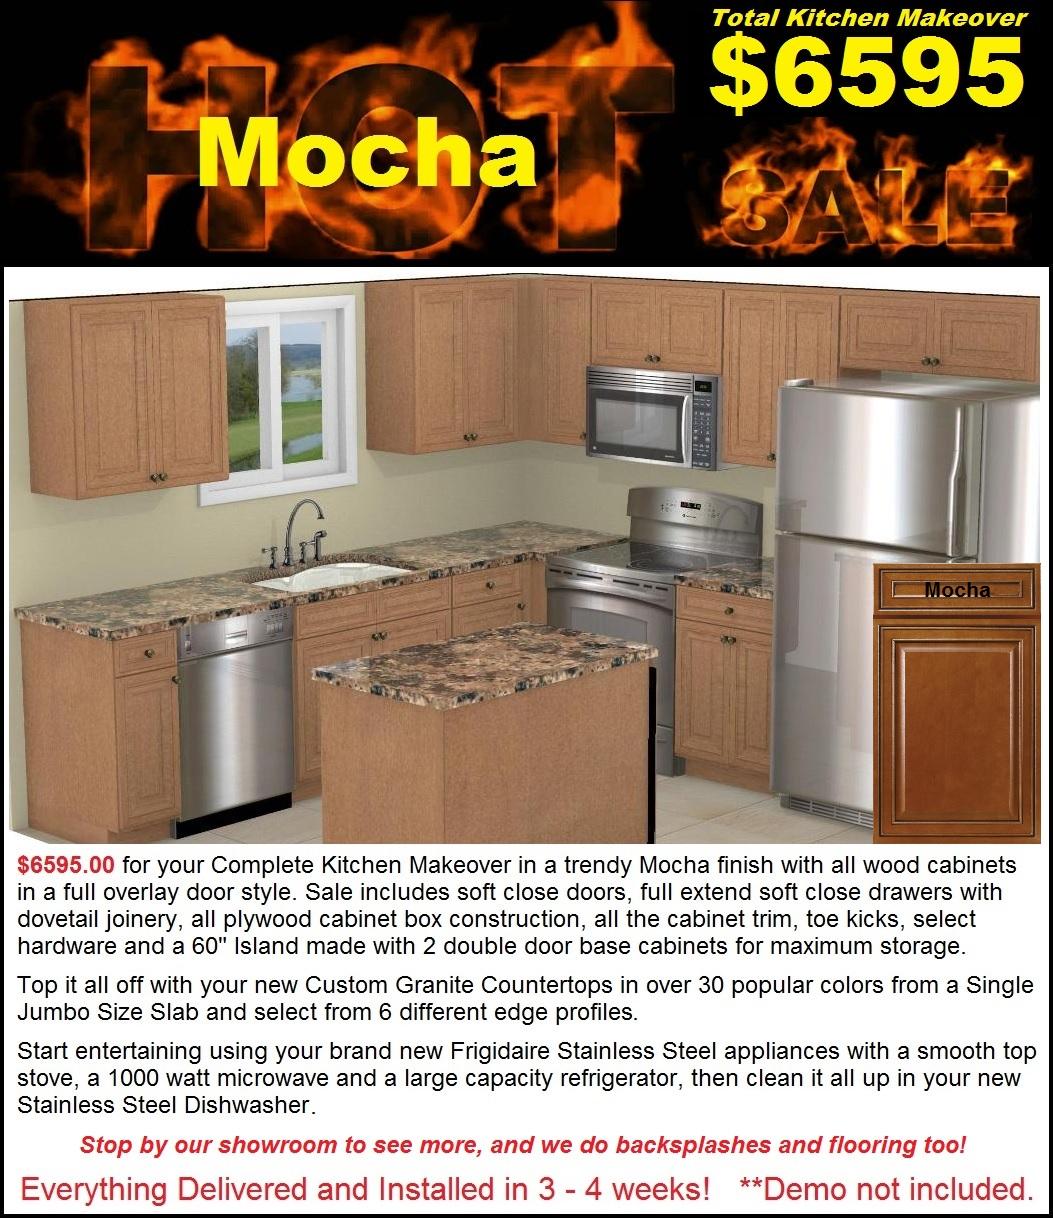 contact mesa phoenix az home remodeling contractor kitchen az kitchen remodeling phoenix az Image description